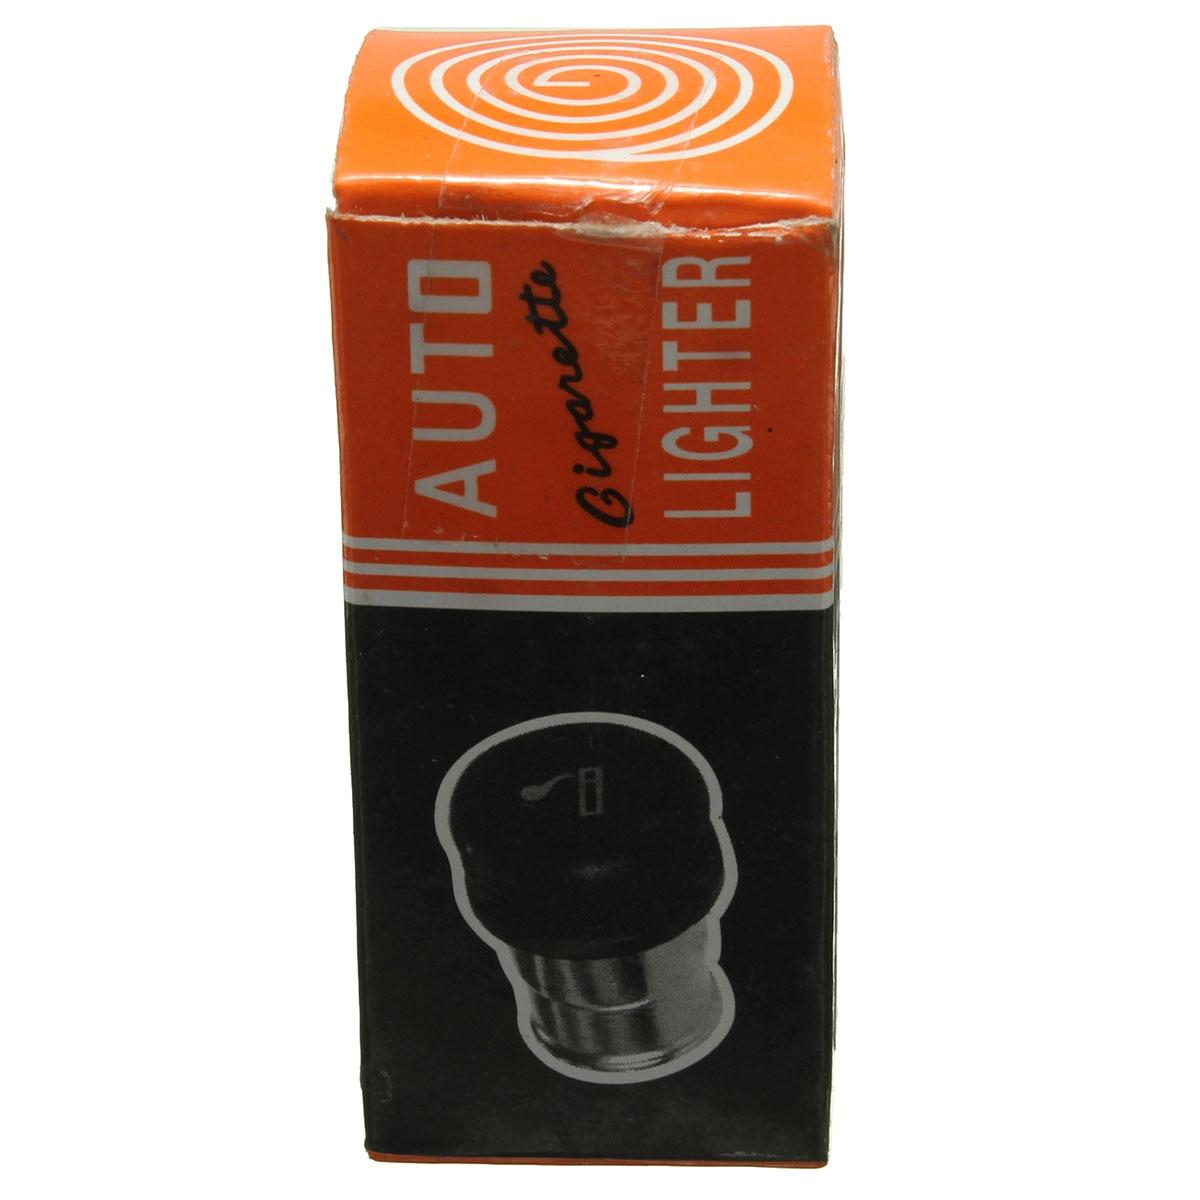 medium resolution of new black universal 12v car auto cigarette cig lighter element plug for vauxhall zafira astra corsa